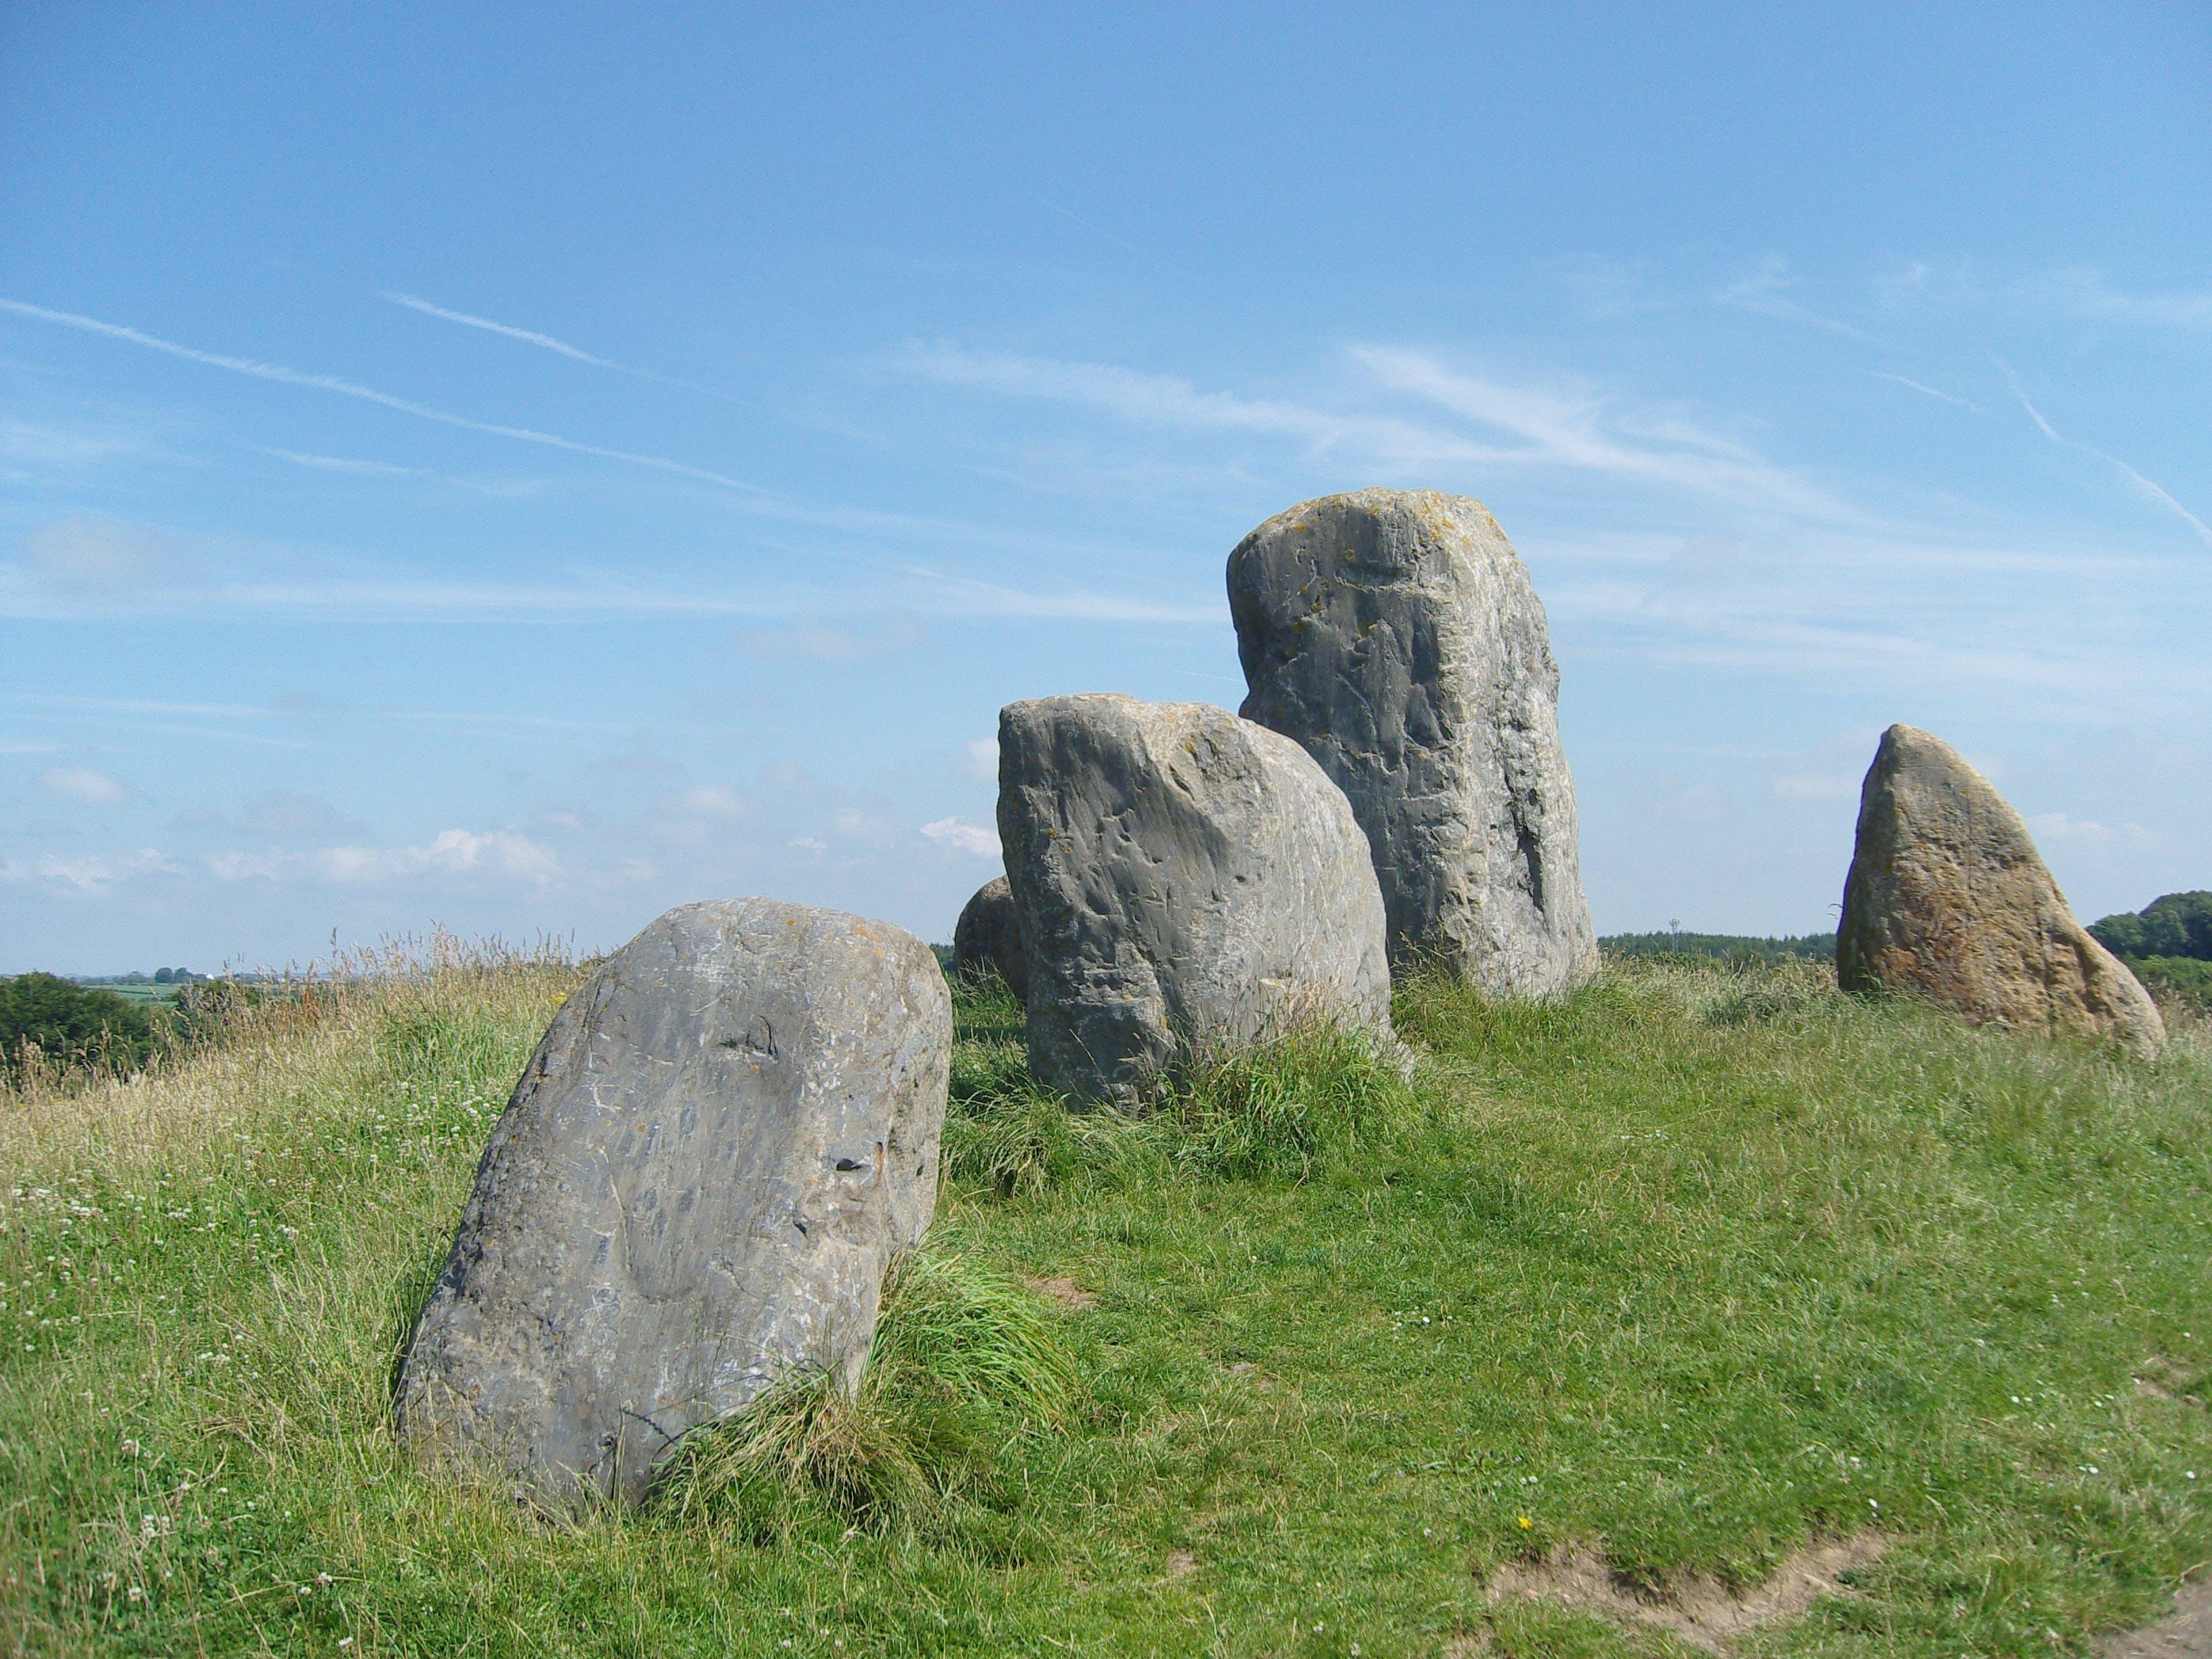 Free stock photo of landscape, landmark, standing, monument